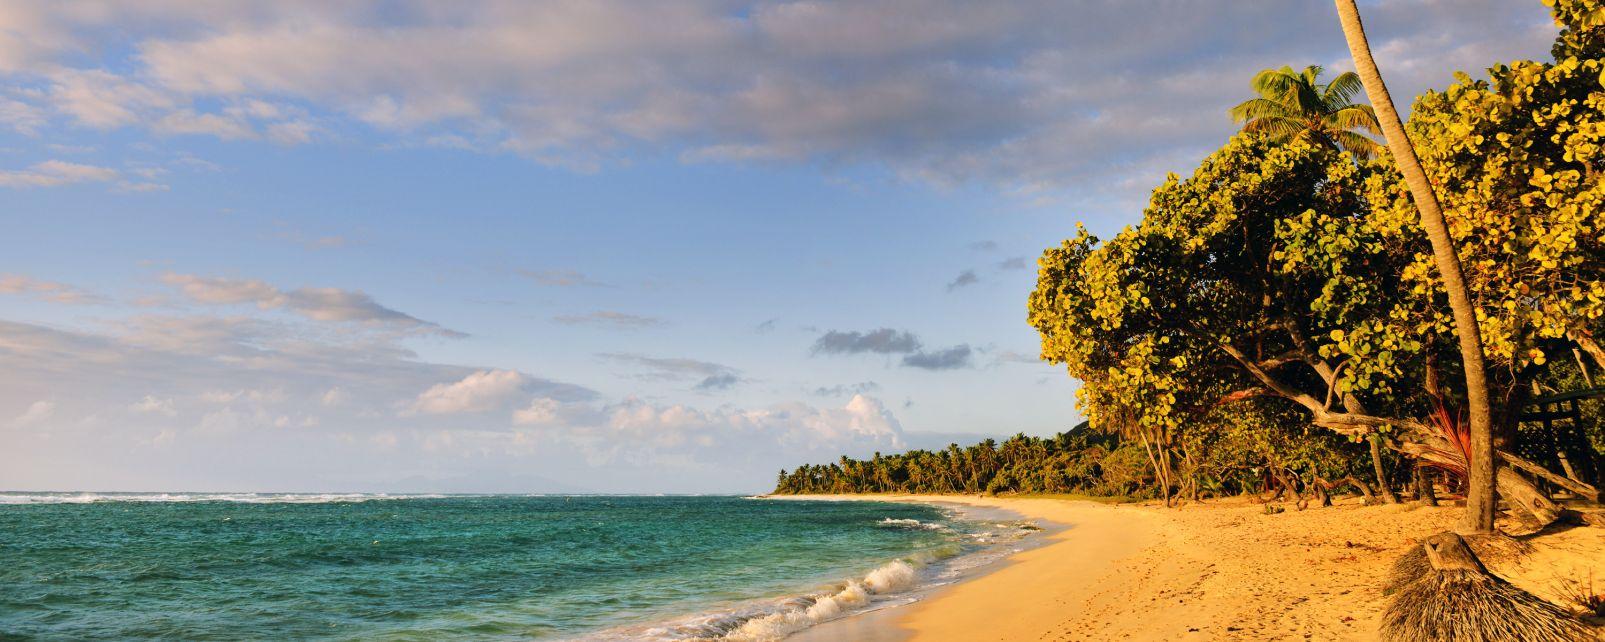 Feuillere Beach, Feuillere beach, Coasts, Marie-Galante